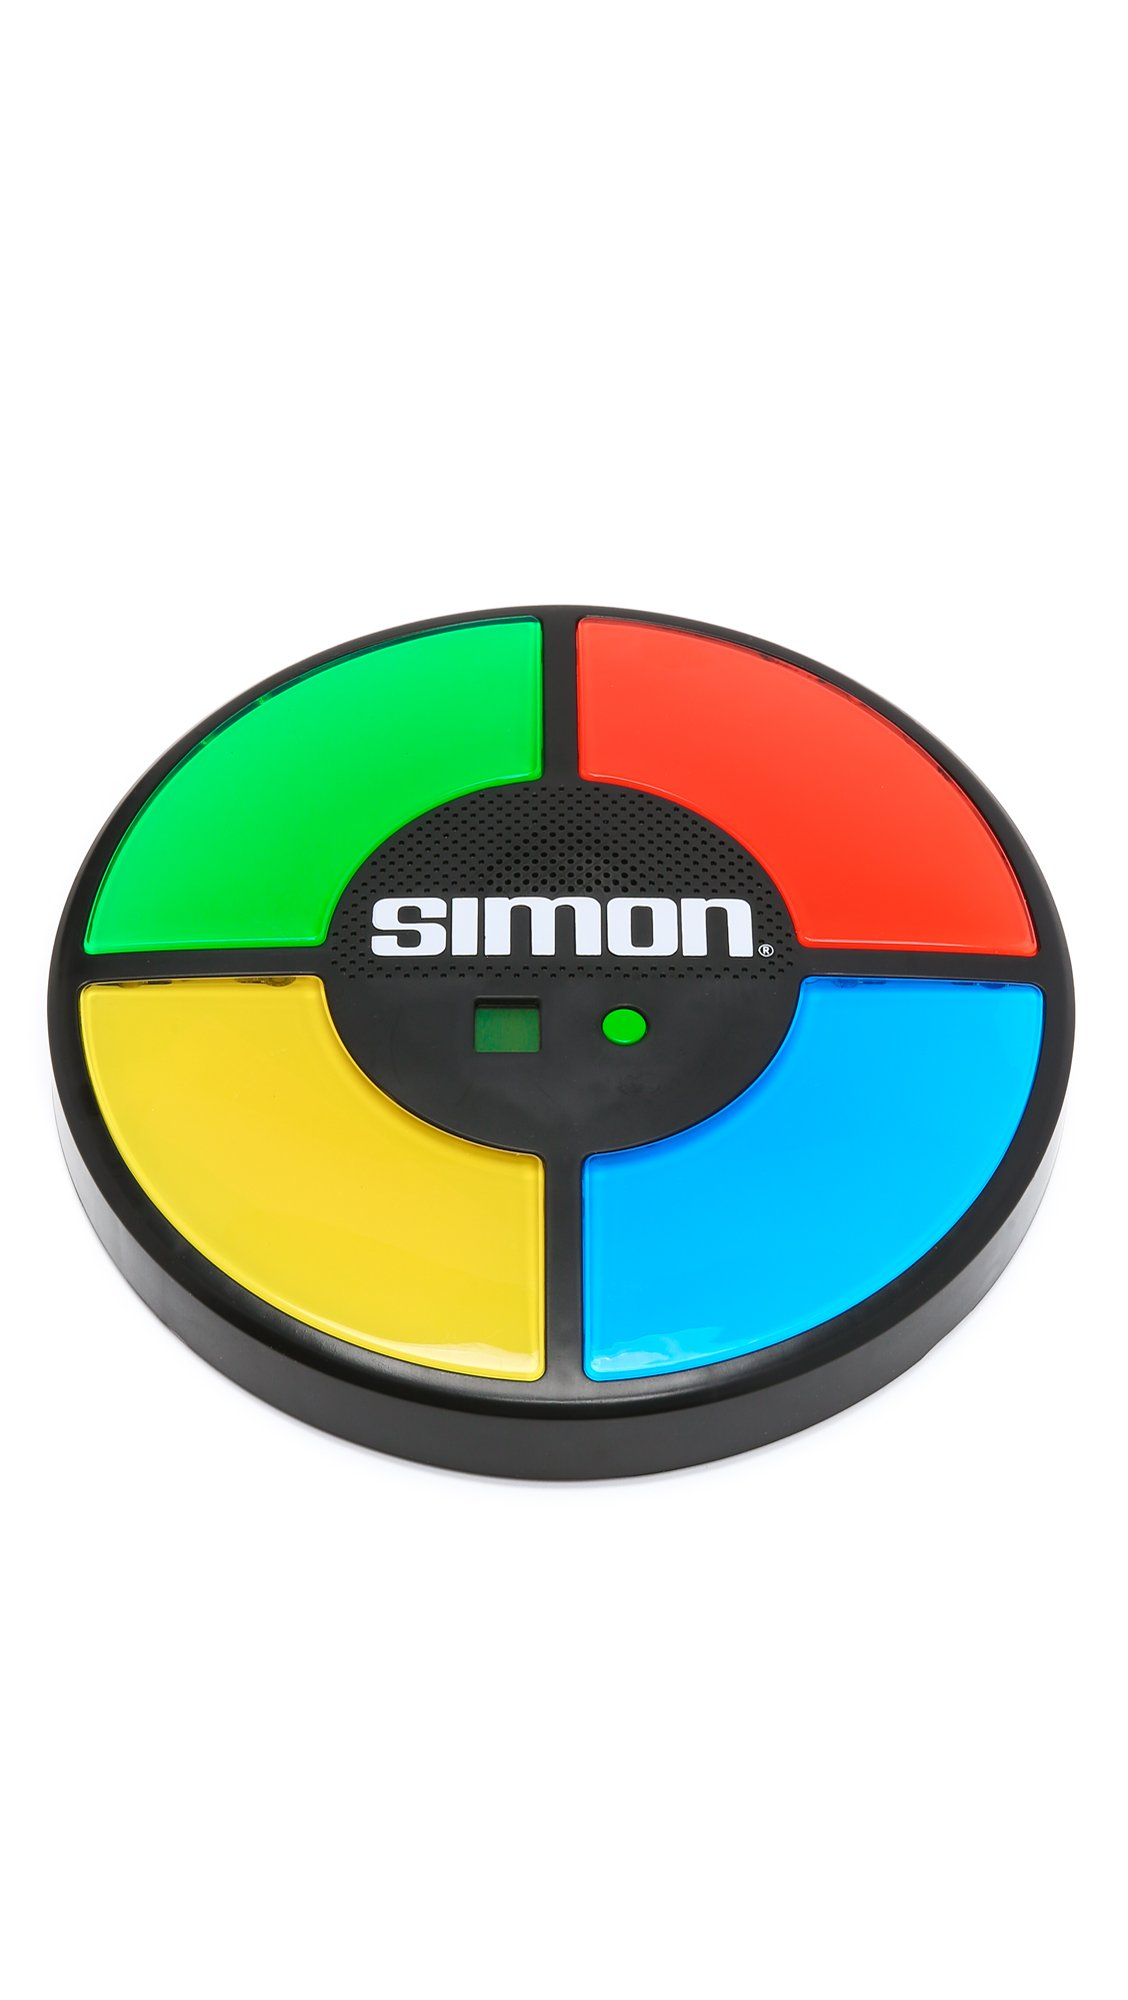 Simon Electronic Game product image